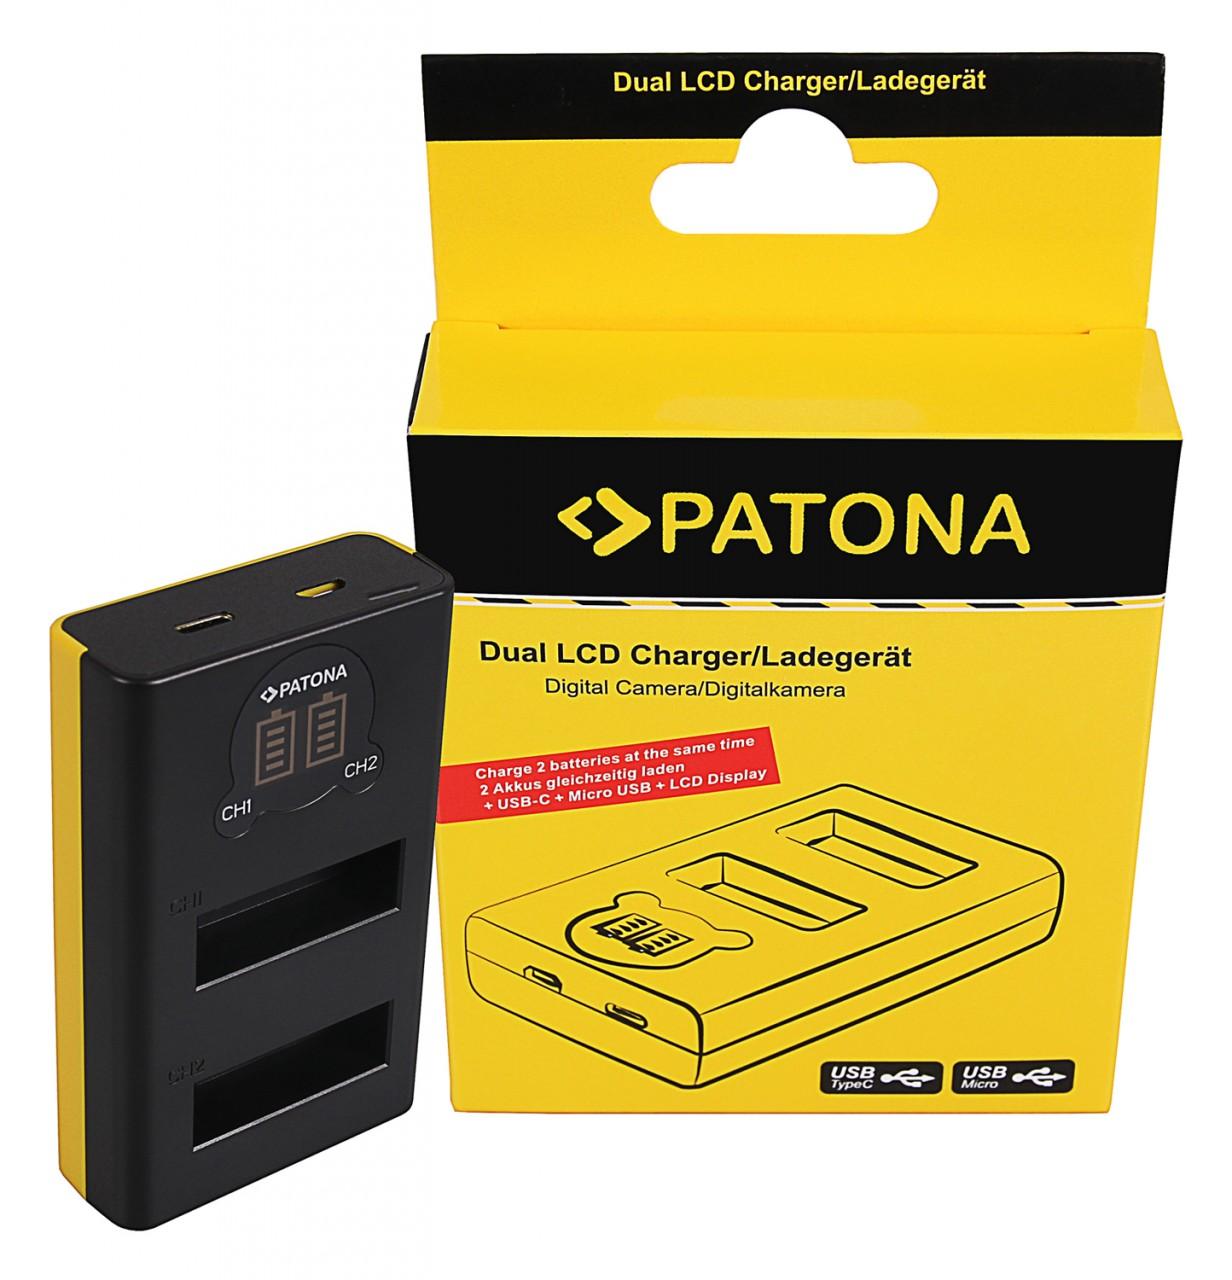 PATONA Dual LCD USB Charger f. DJI Osmo Action Kamera AB1 P0